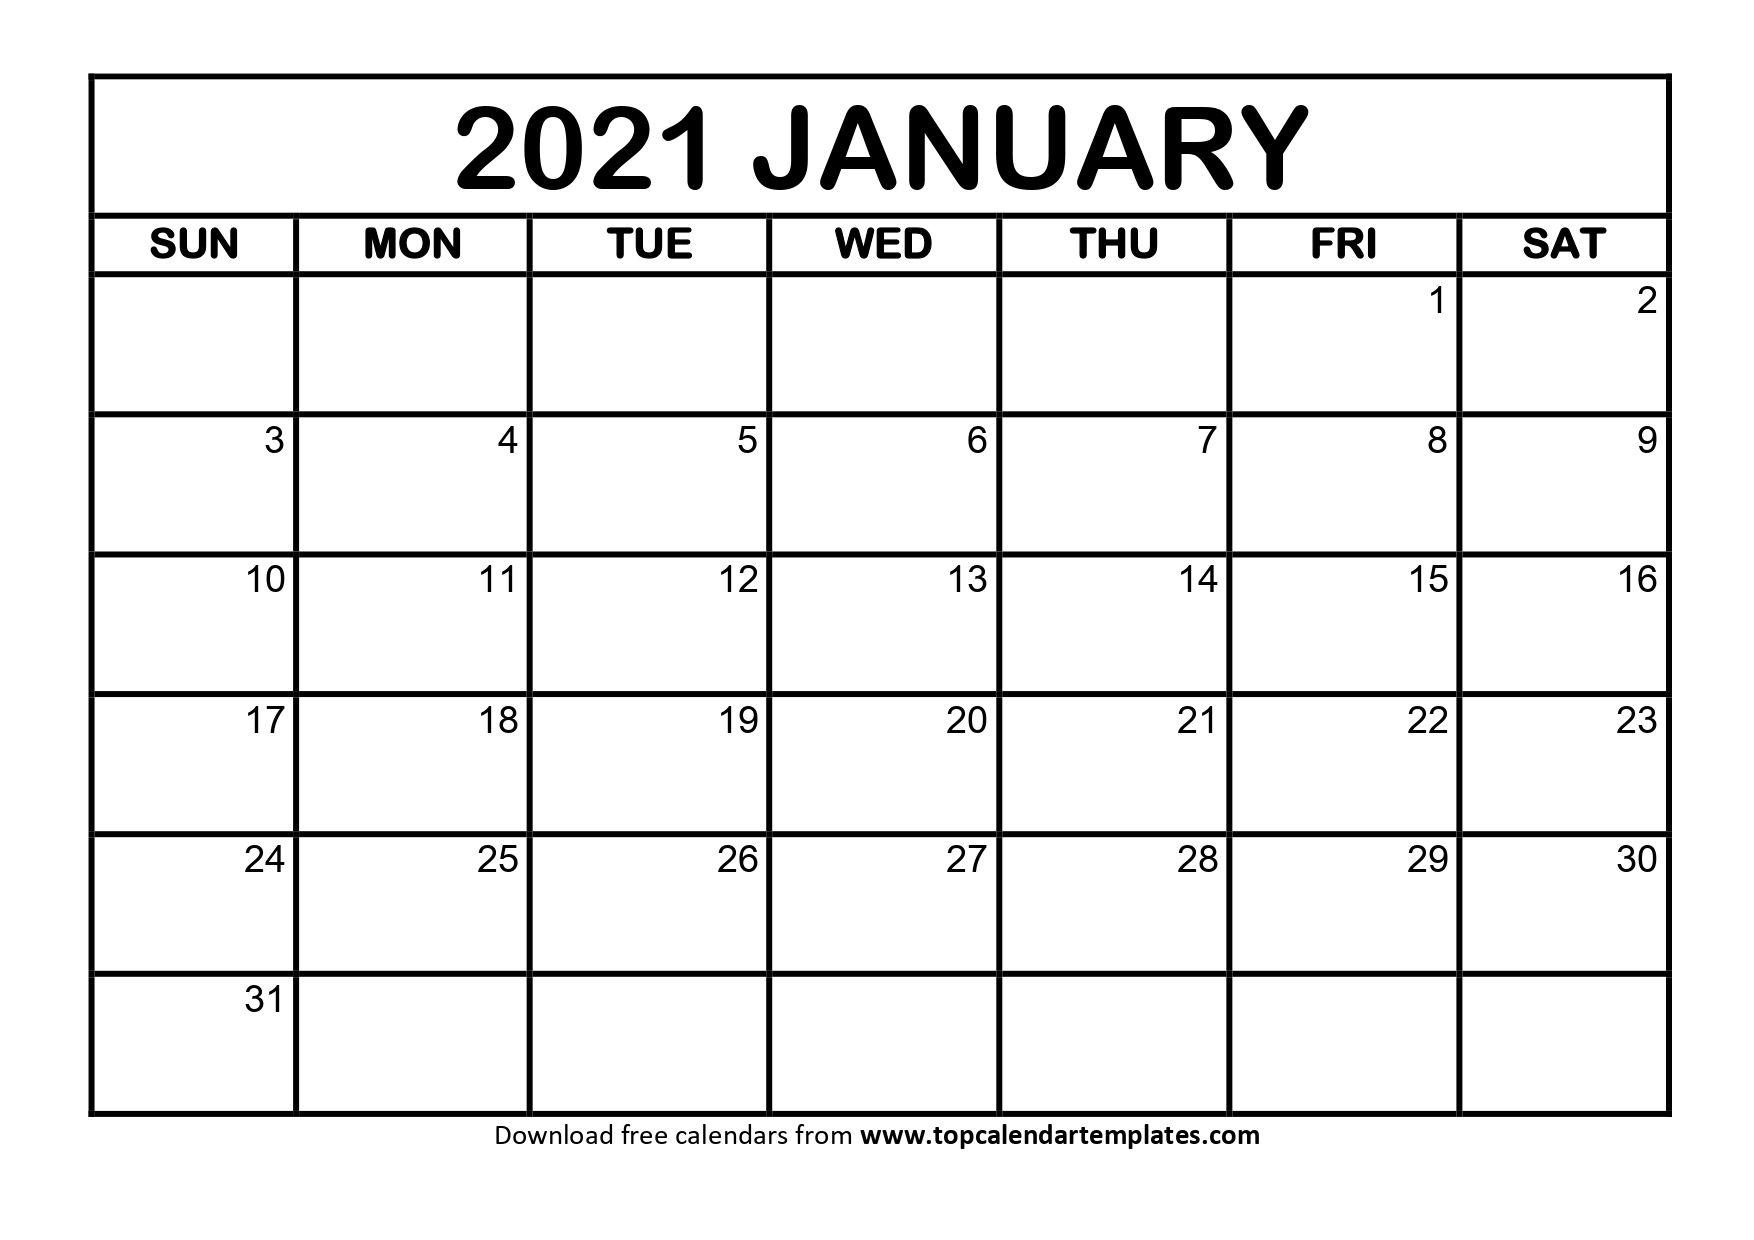 Printable January 2021 Calendar Template Download Now